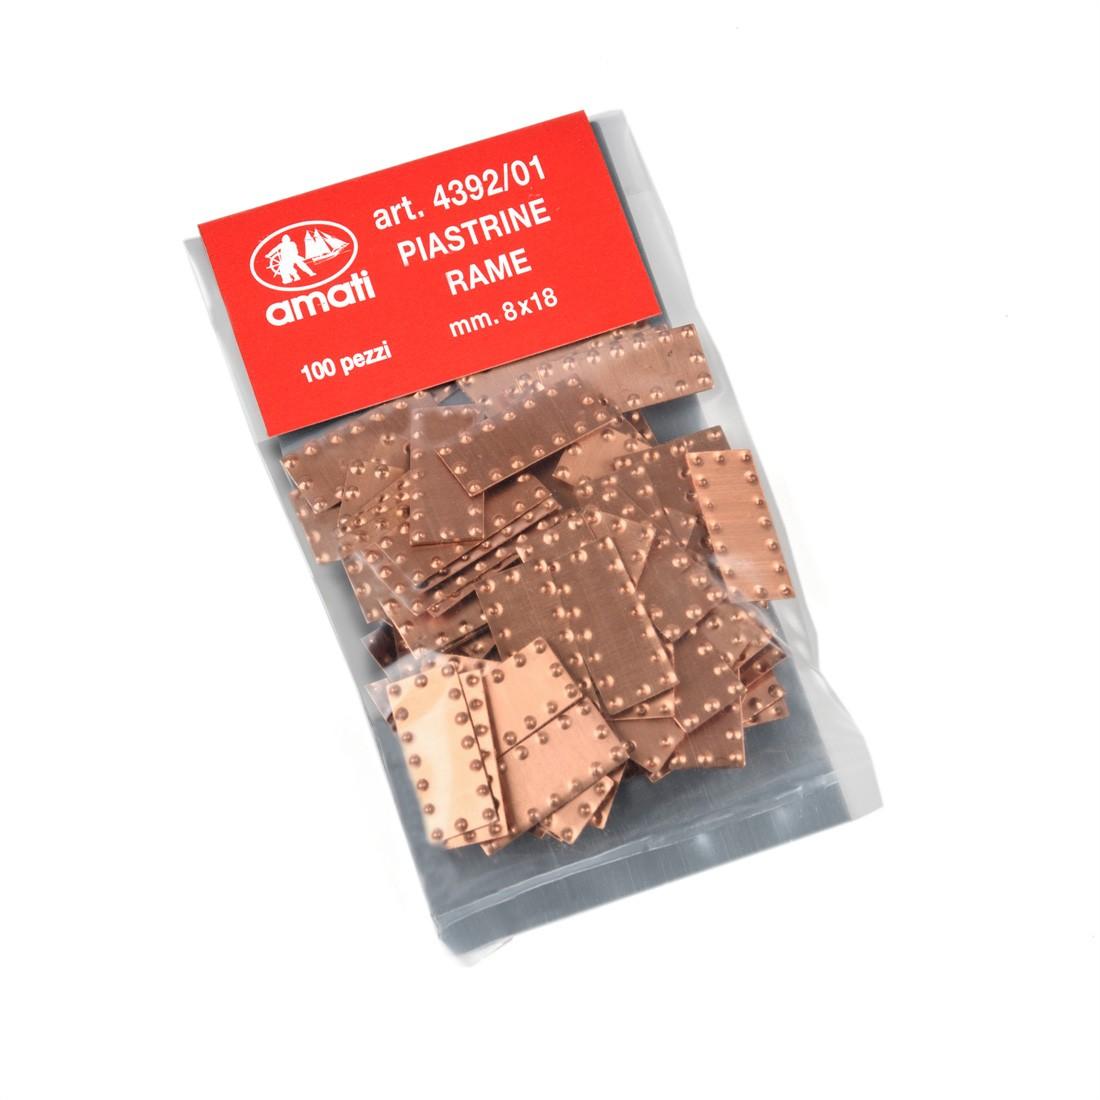 Copper plates mm.8x18